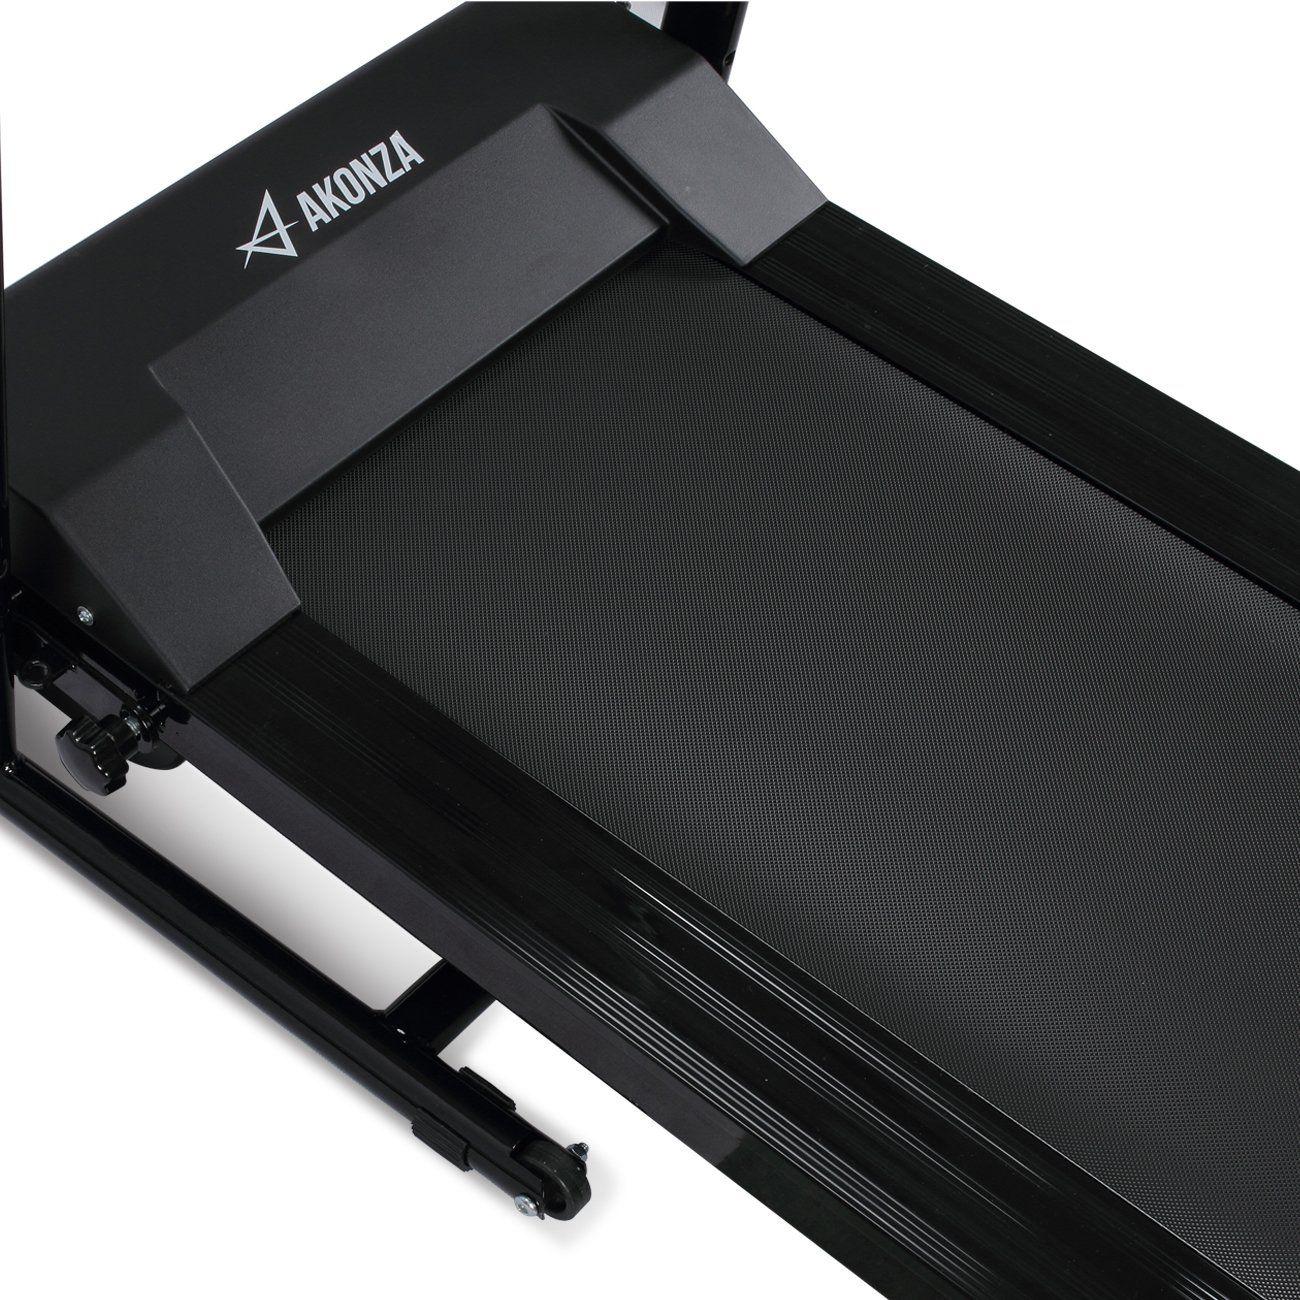 Black Akonza 1100W Folding Electric Treadmill Fitness Power ...